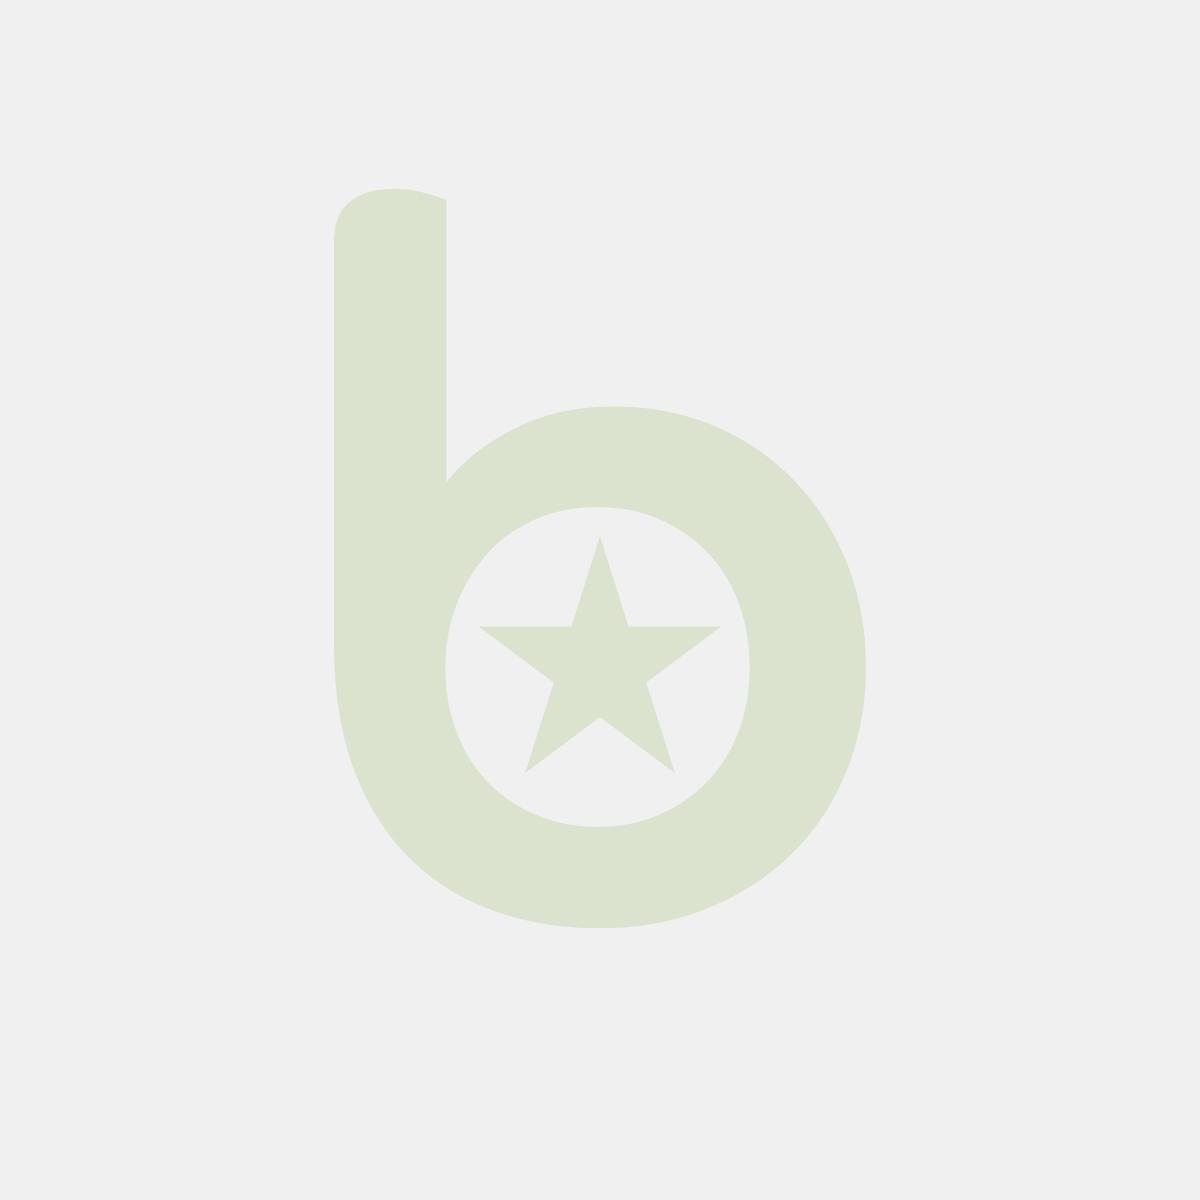 Etykieta 57x43 (800 etykiet na rolce)